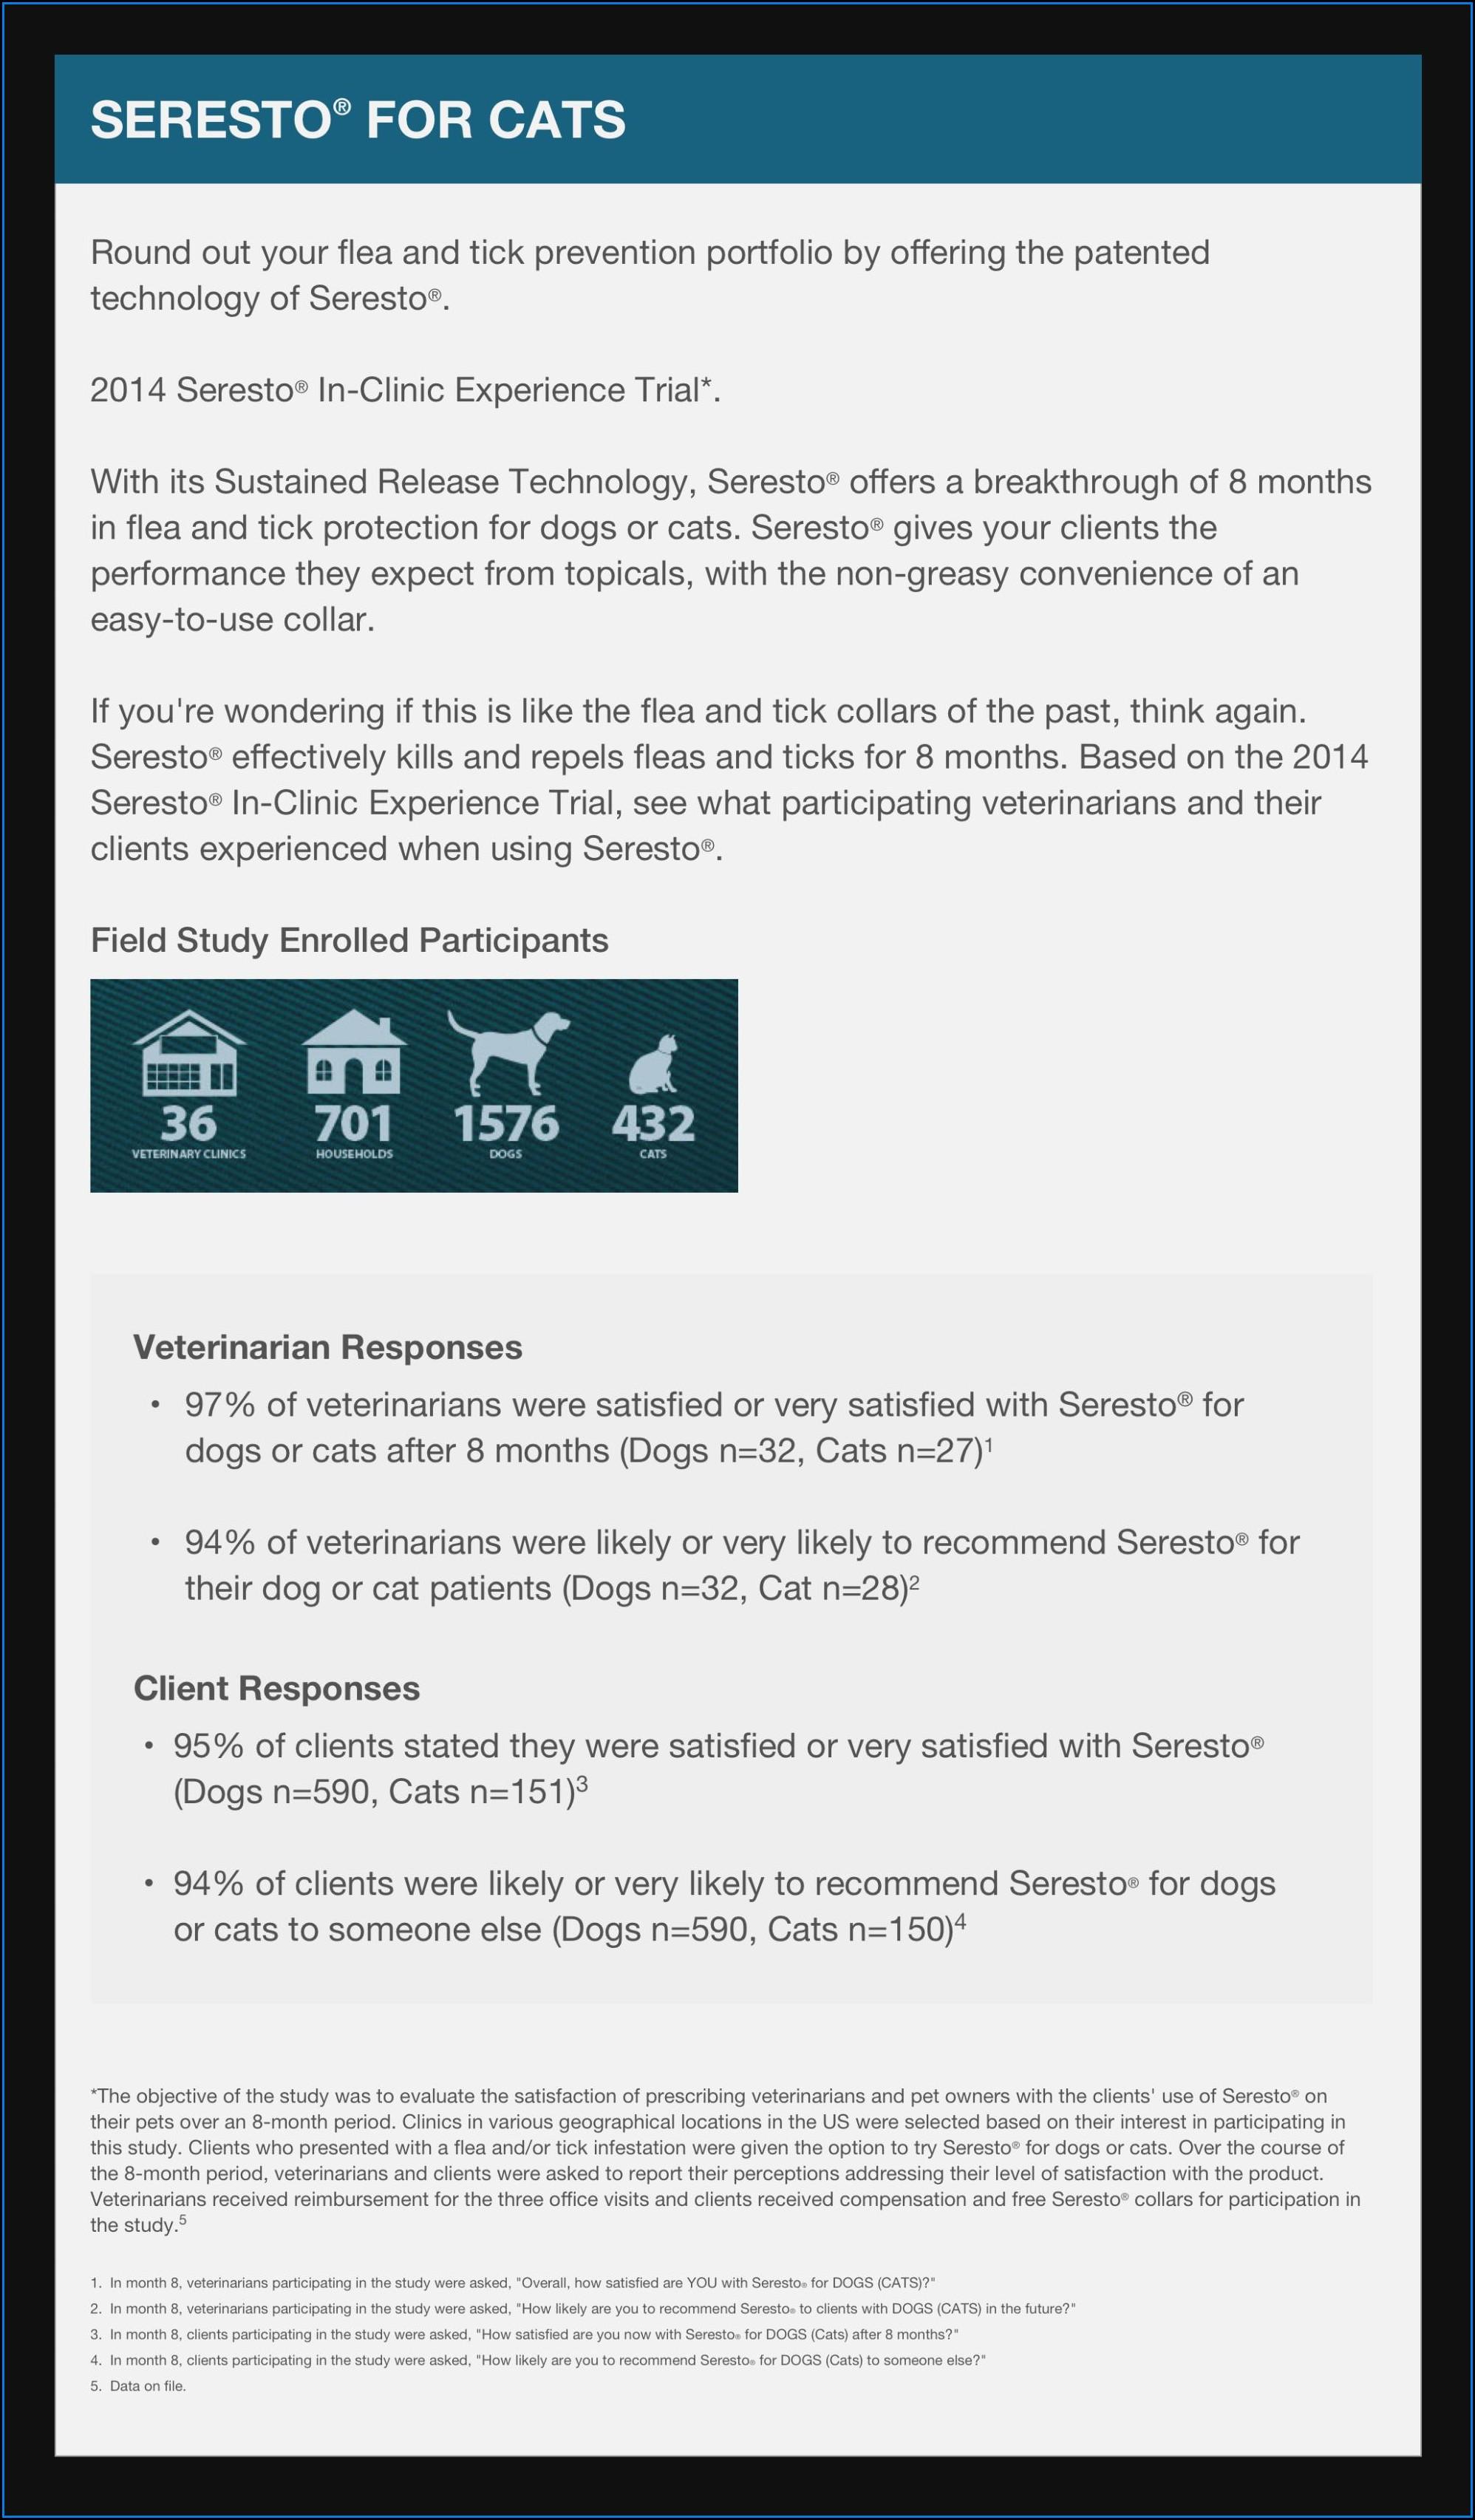 Seresto Rebate Form 2017 Form Resume Examples Ey39g0d12v